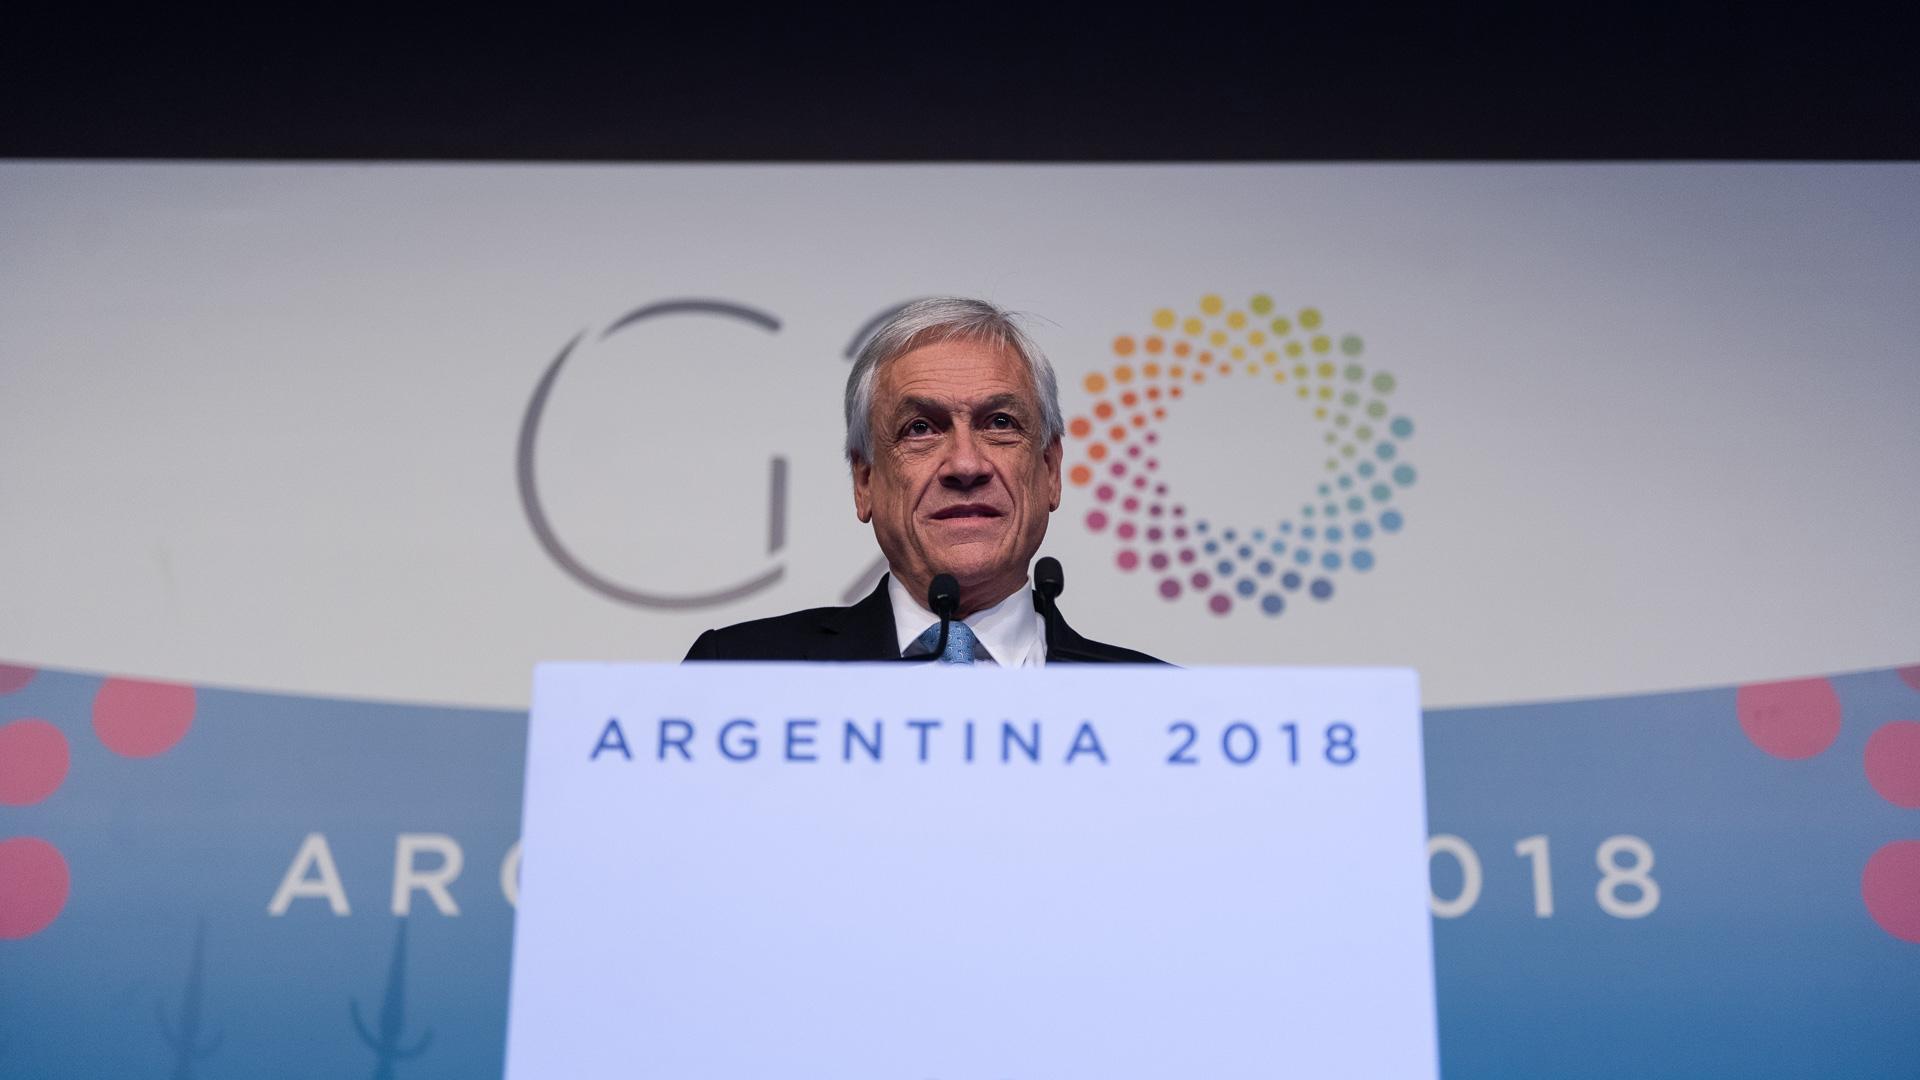 El presidente de Chile Sebastián Piñera